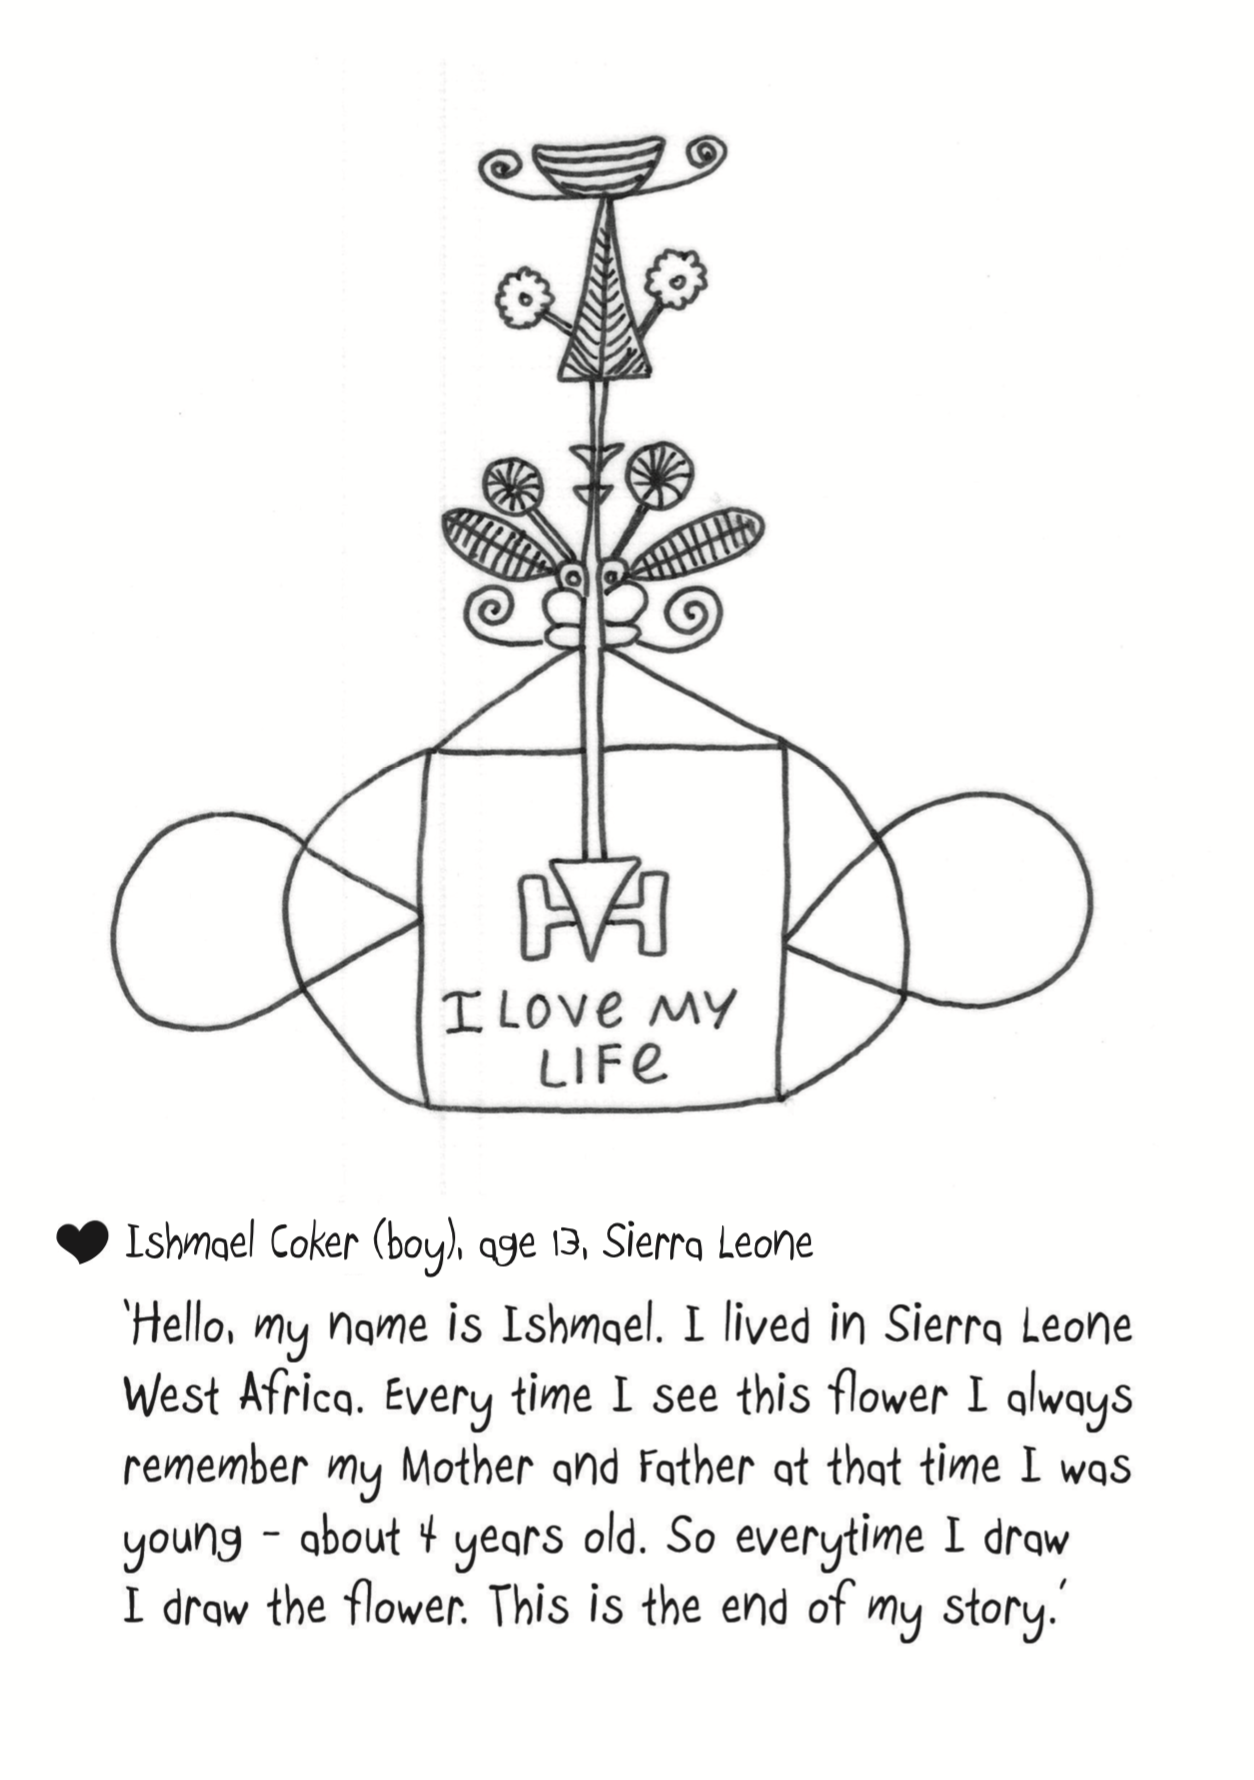 sierra leone orphfund book art colouring